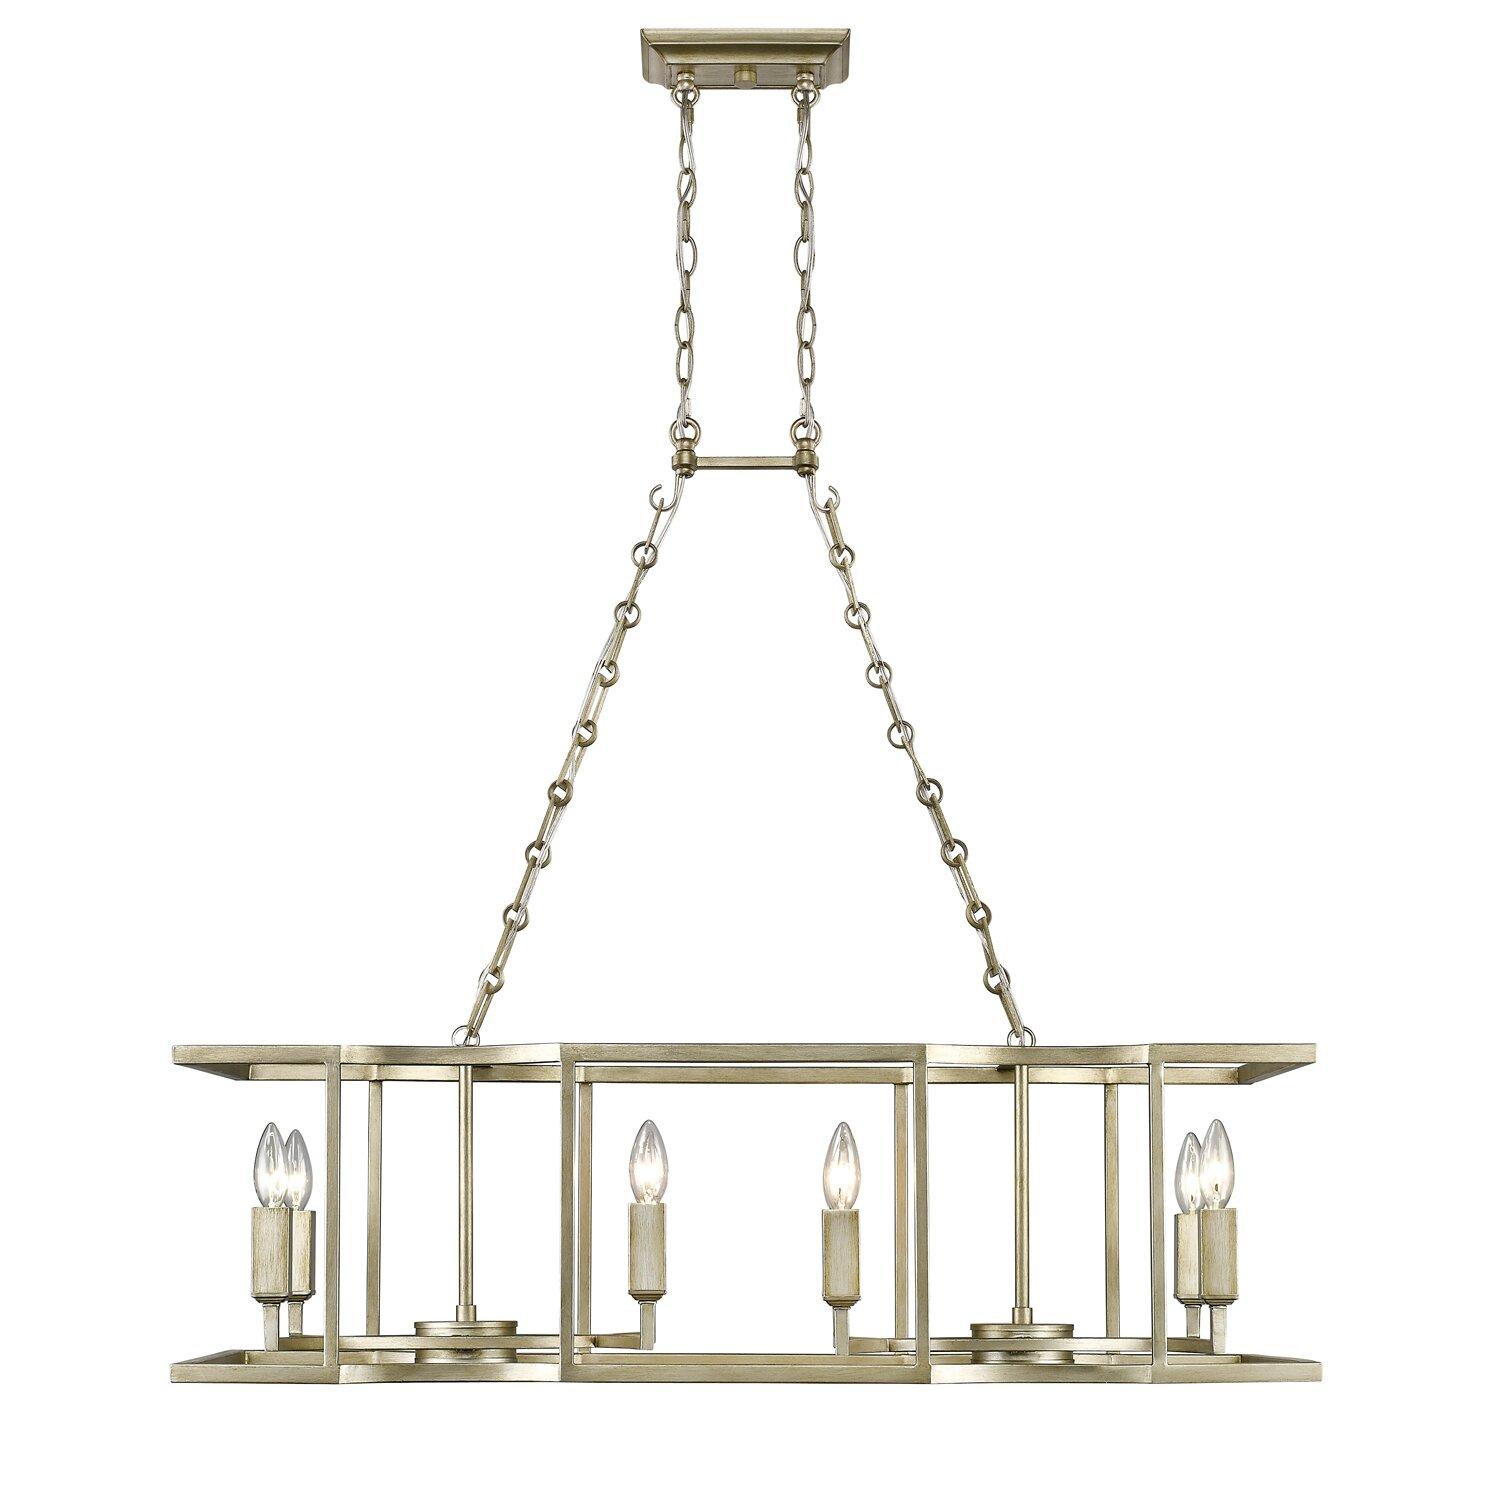 mercer41 dawson 8 light kitchen island pendant wayfair. Black Bedroom Furniture Sets. Home Design Ideas